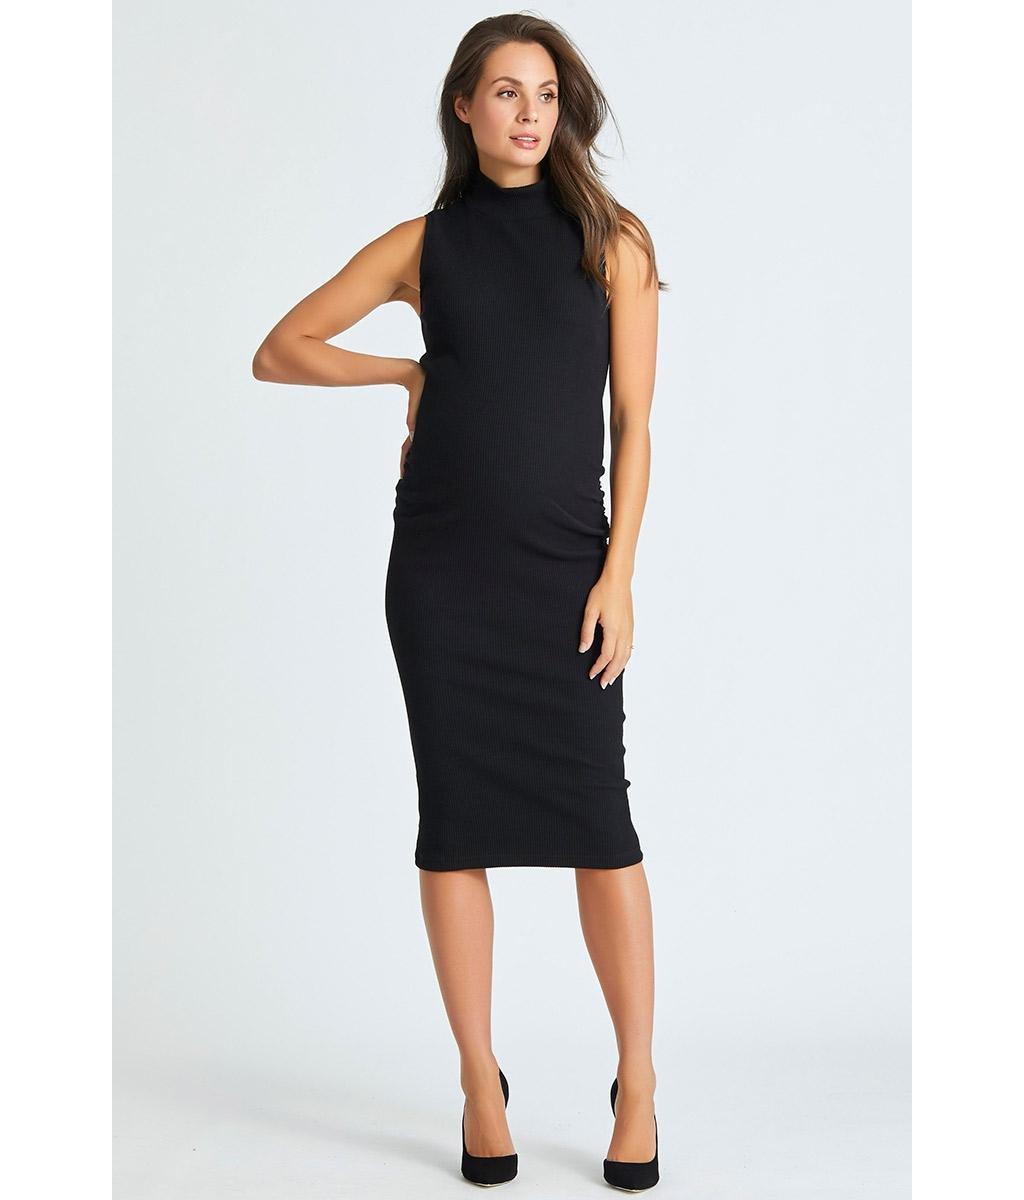 Audrey maternity rib dress 3 bears stylish black cotton stretch rib maternity bodycon dress ombrellifo Choice Image